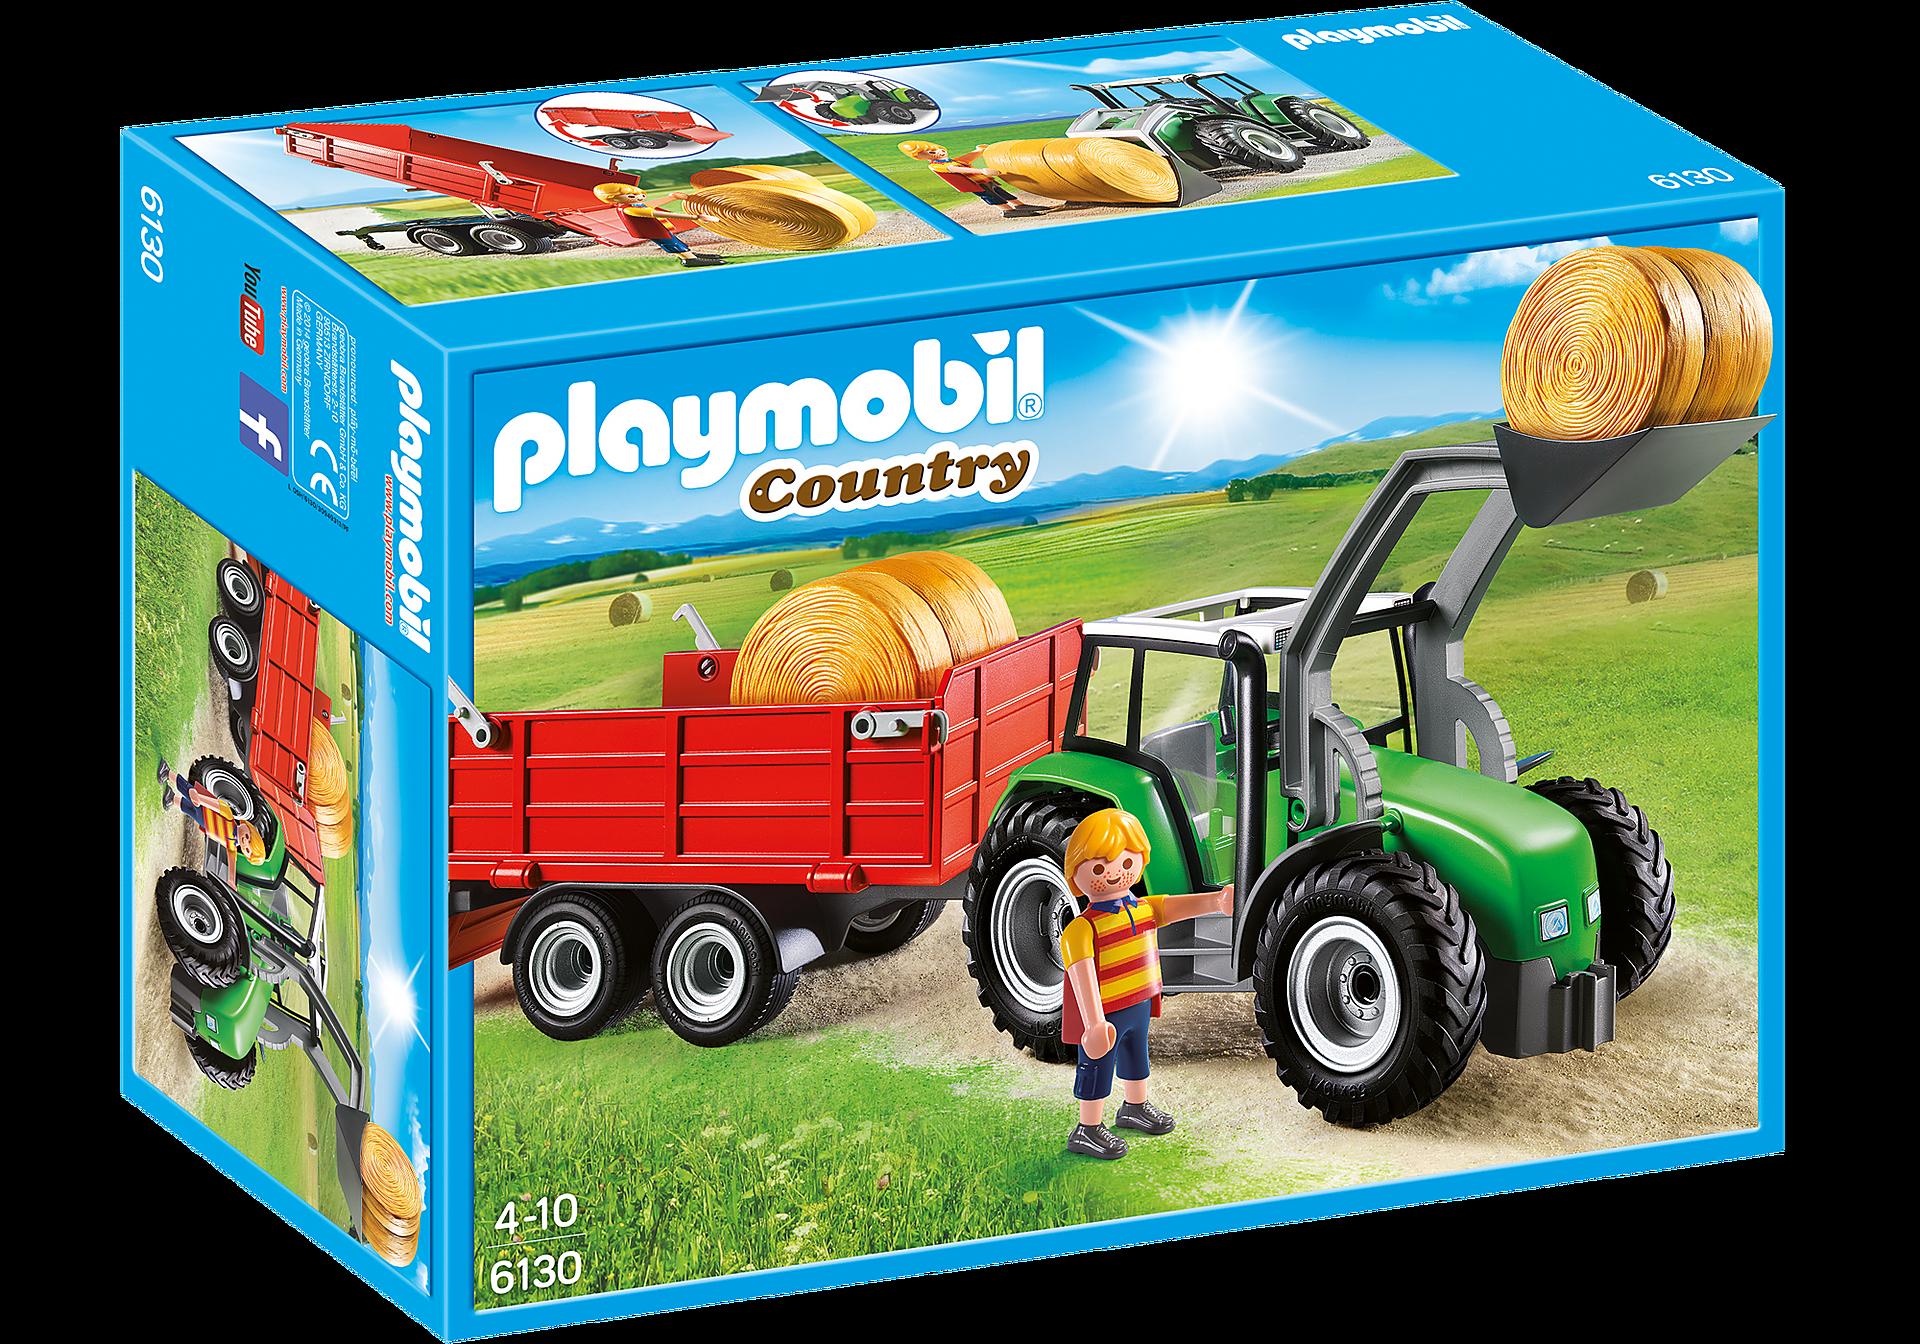 http://media.playmobil.com/i/playmobil/6130_product_box_front/Tracteur avec pelle et remorque